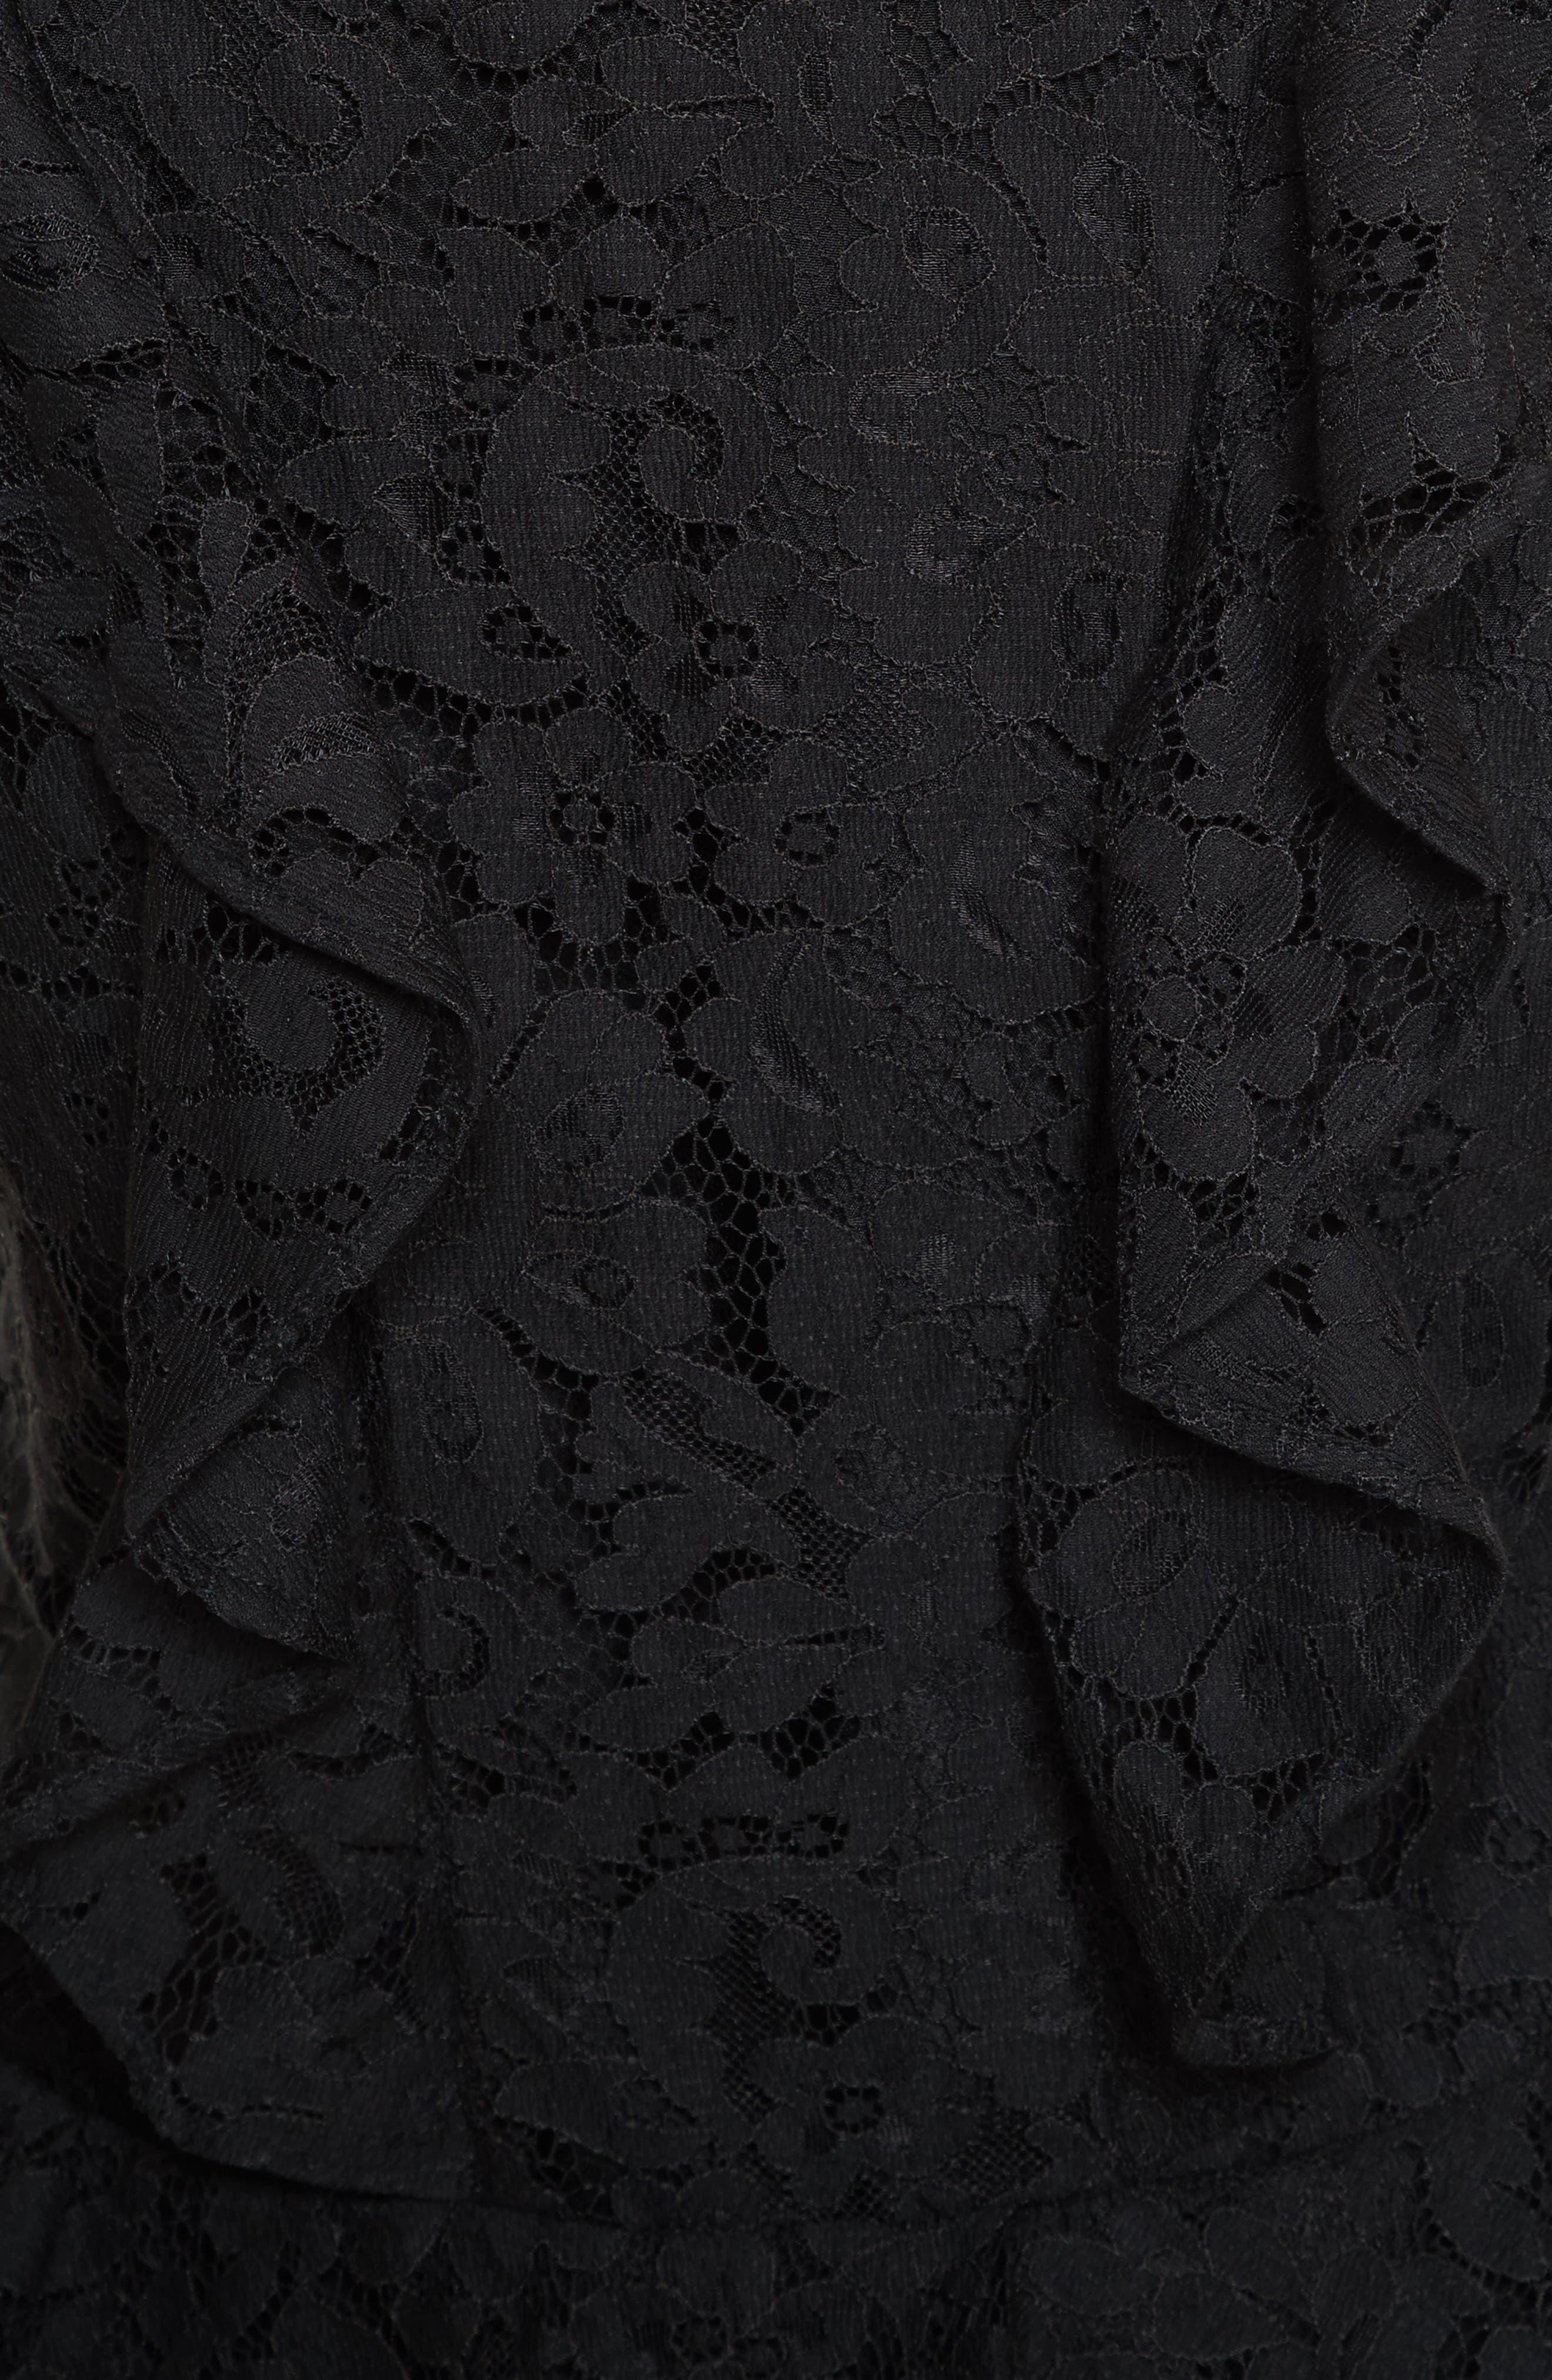 Acostas Ruffle & Lace Dress,                             Alternate thumbnail 5, color,                             Caviar